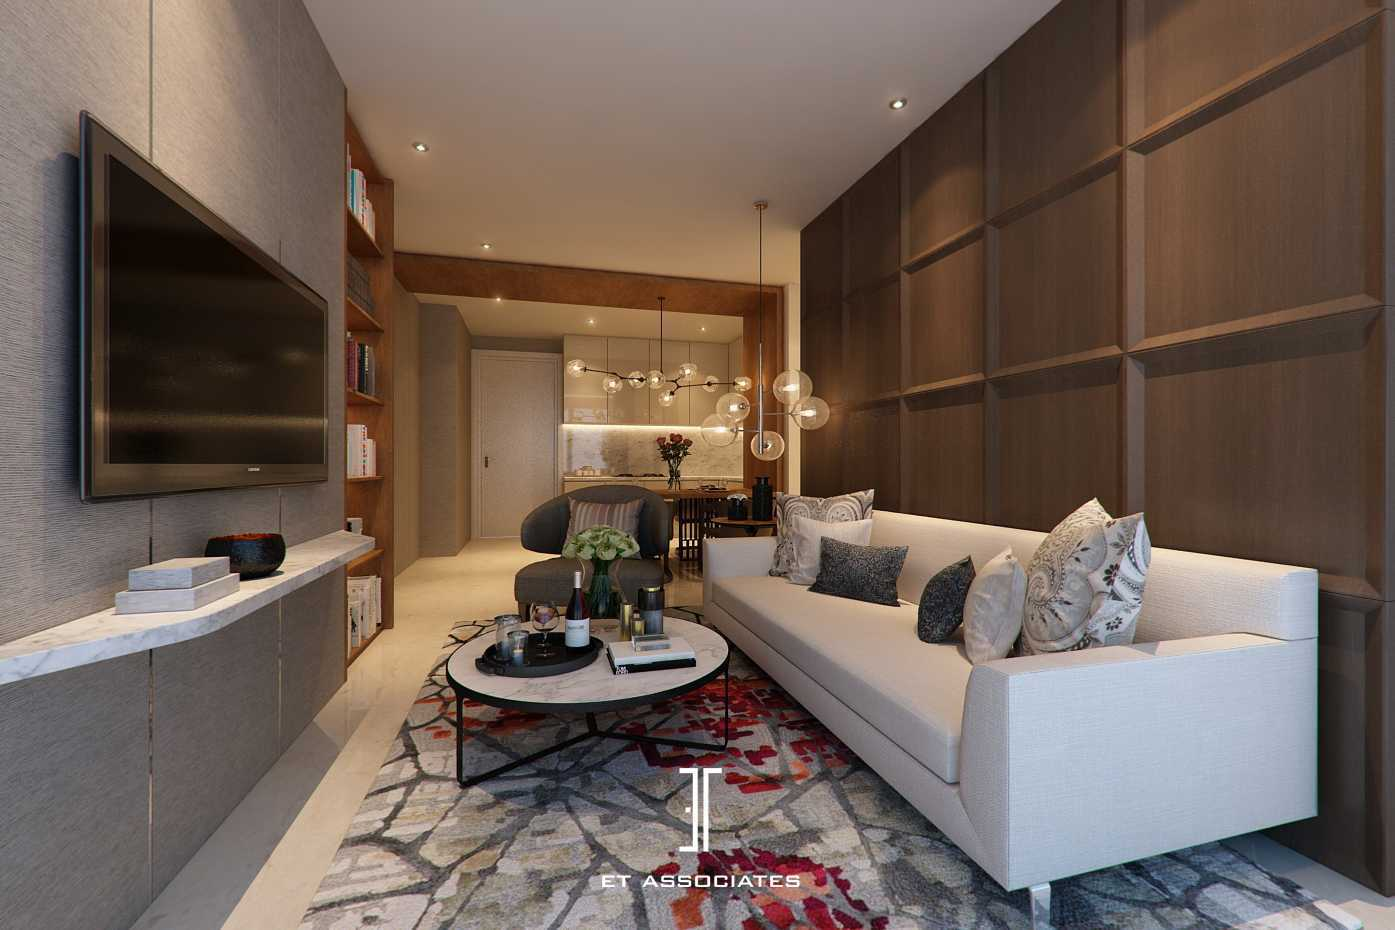 Et Associates Private Apartment At Ciputra World Kuningan, Kuningan Sub-District, Kuningan Regency, West Java, Indonesia  Orchard-Satrio-Living-Room Kontemporer,modern  33589